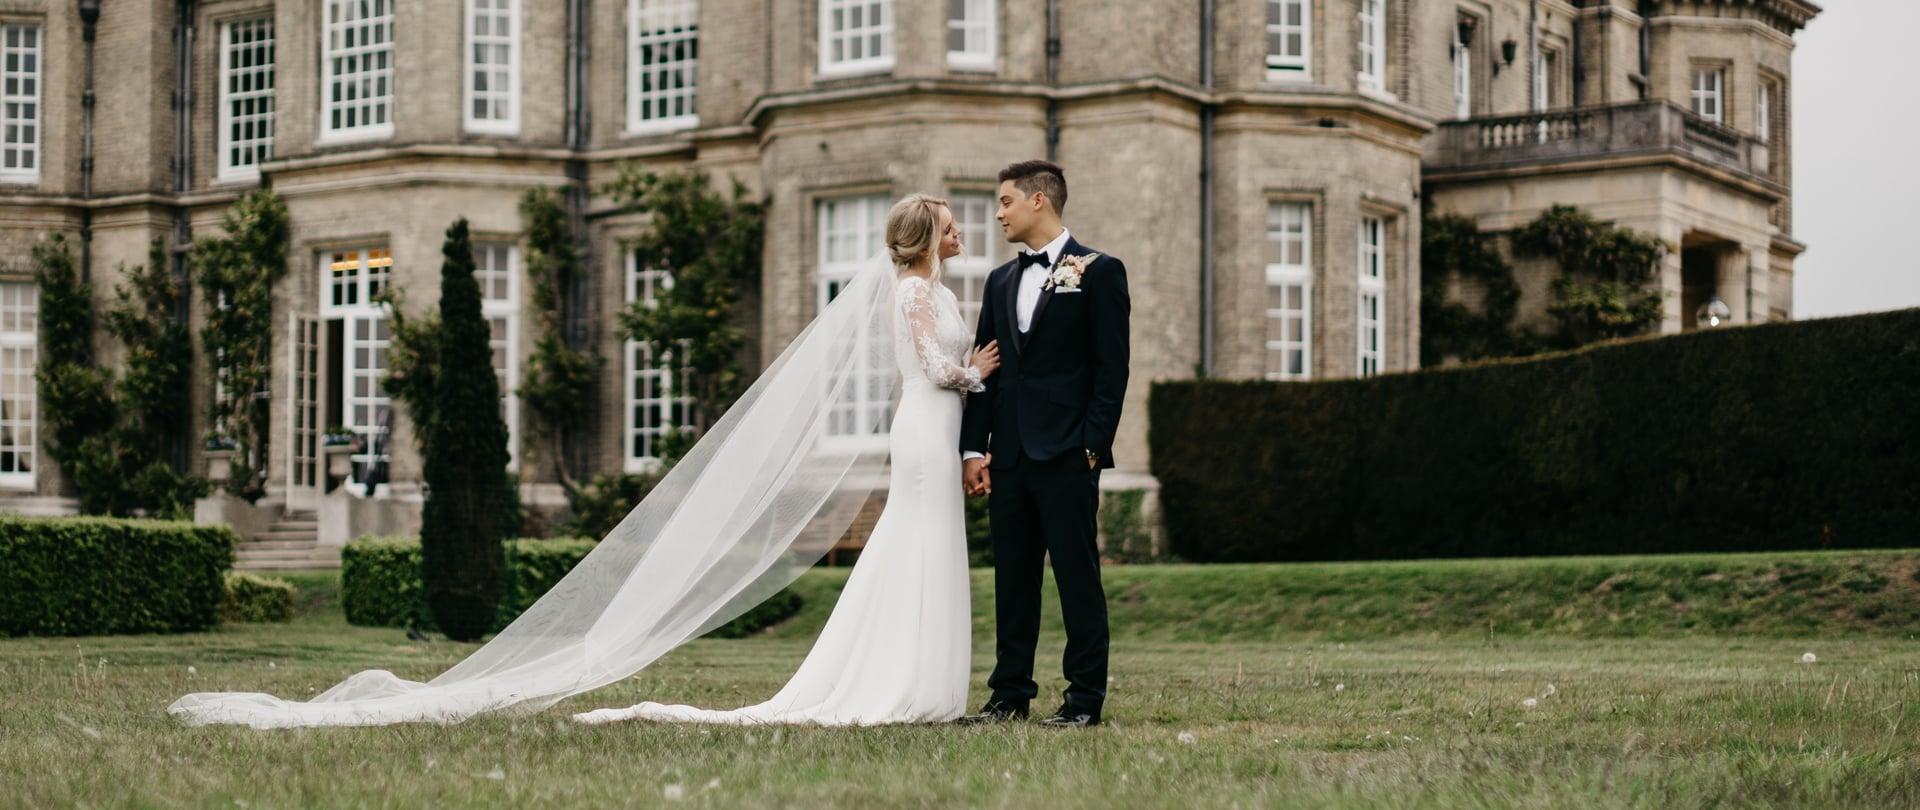 Fionnuala & Dan Wedding Video Filmed at Buckinghamshire, England